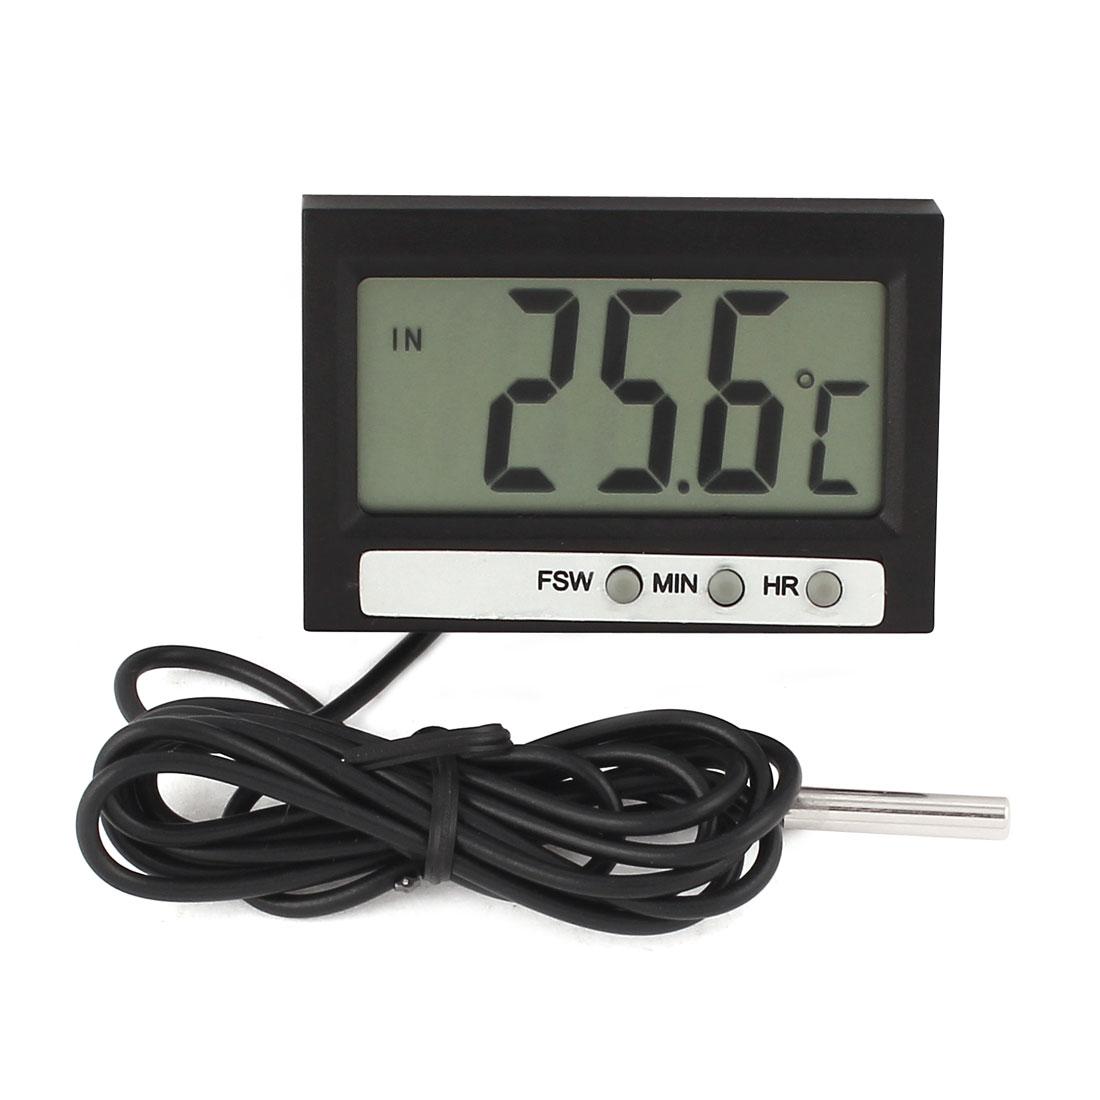 Mini Digital LCD Temperature Meter Thermometer Indoor